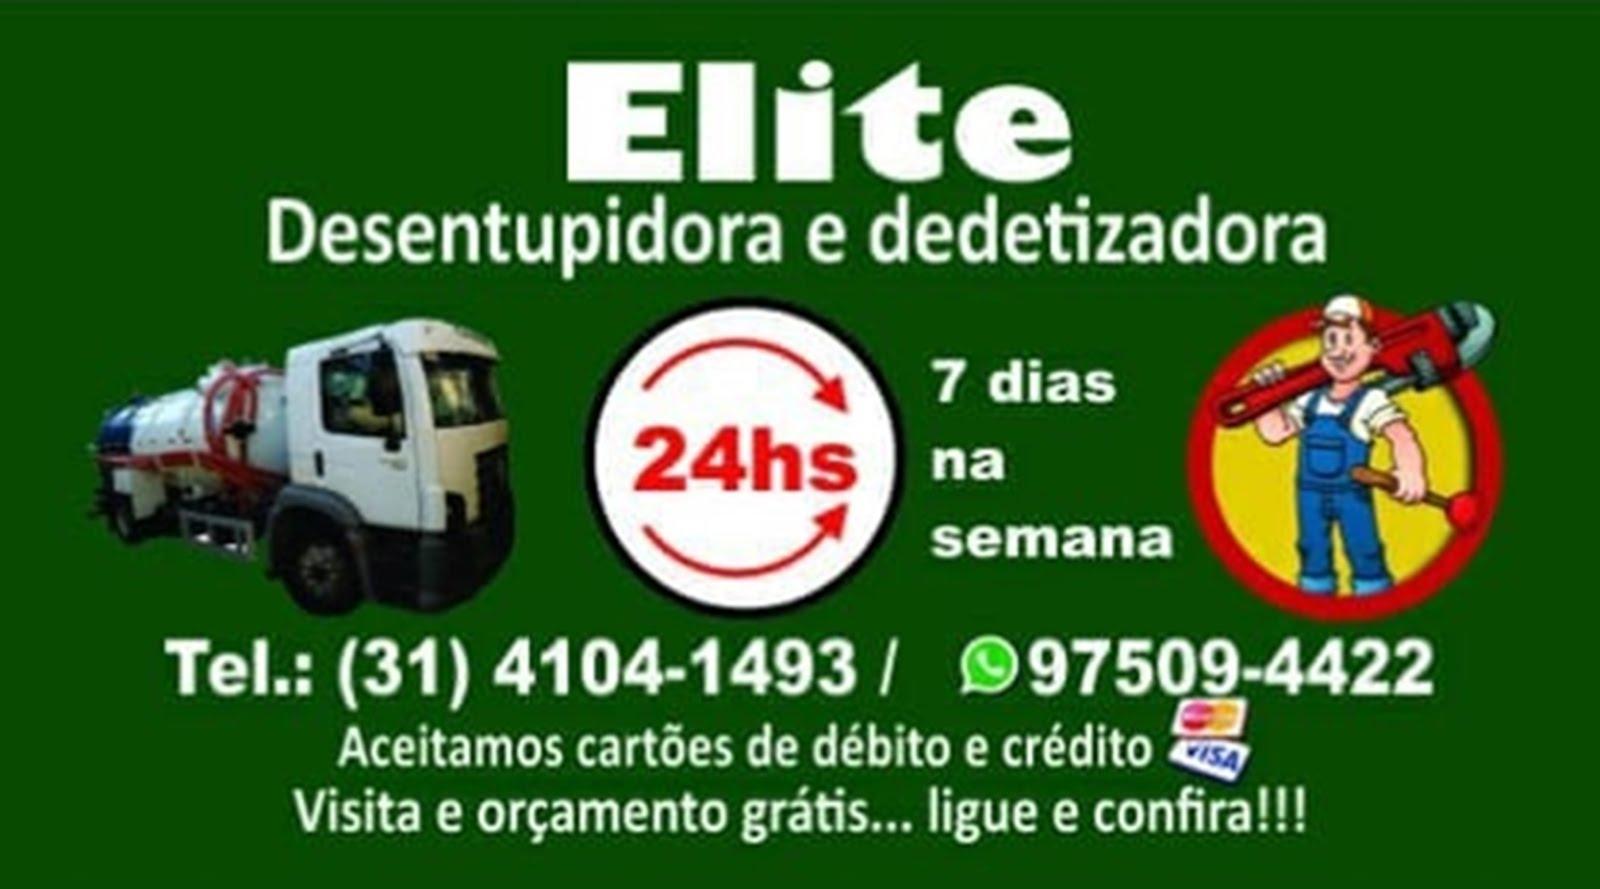 ELITE DESENTUPIDORA DEDETIZADORA BH